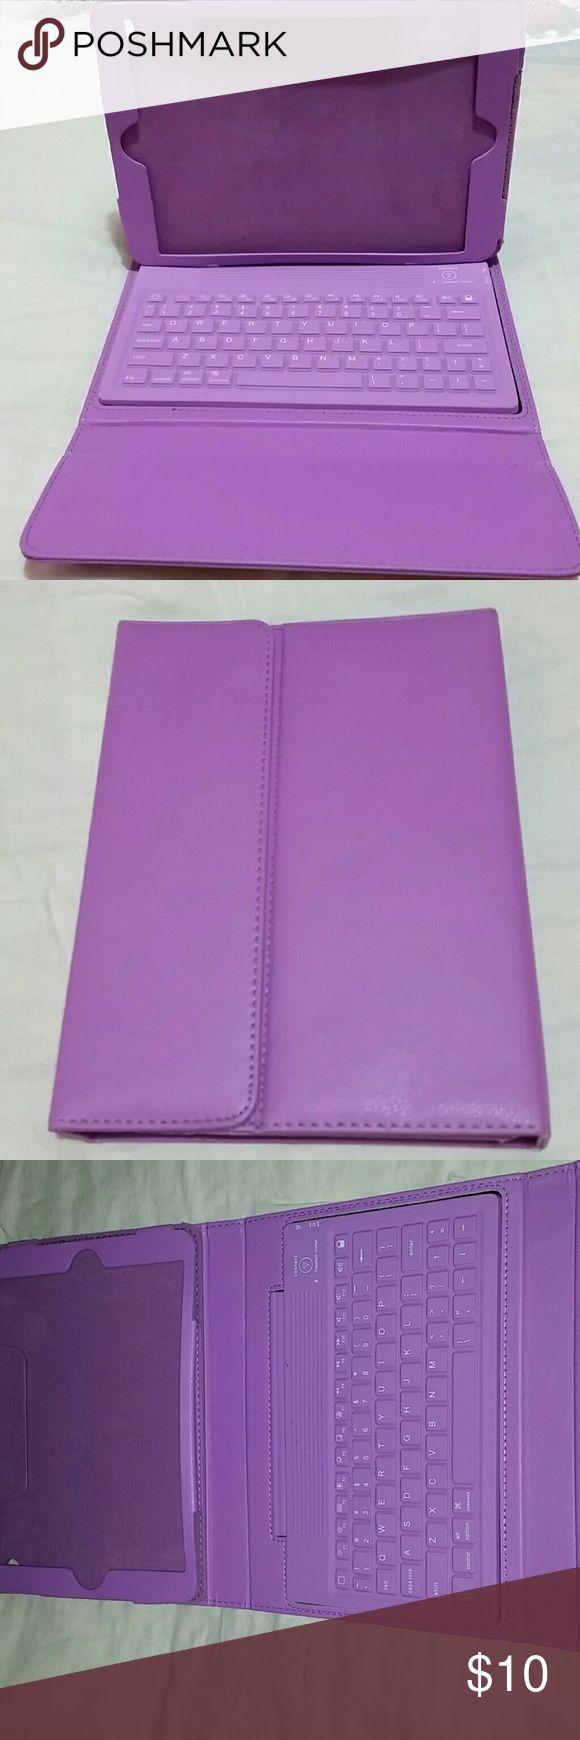 I pad 2 Bluetooth keyboard IPad 2 Bluetooth keyboard case Accessories Tablet Cases